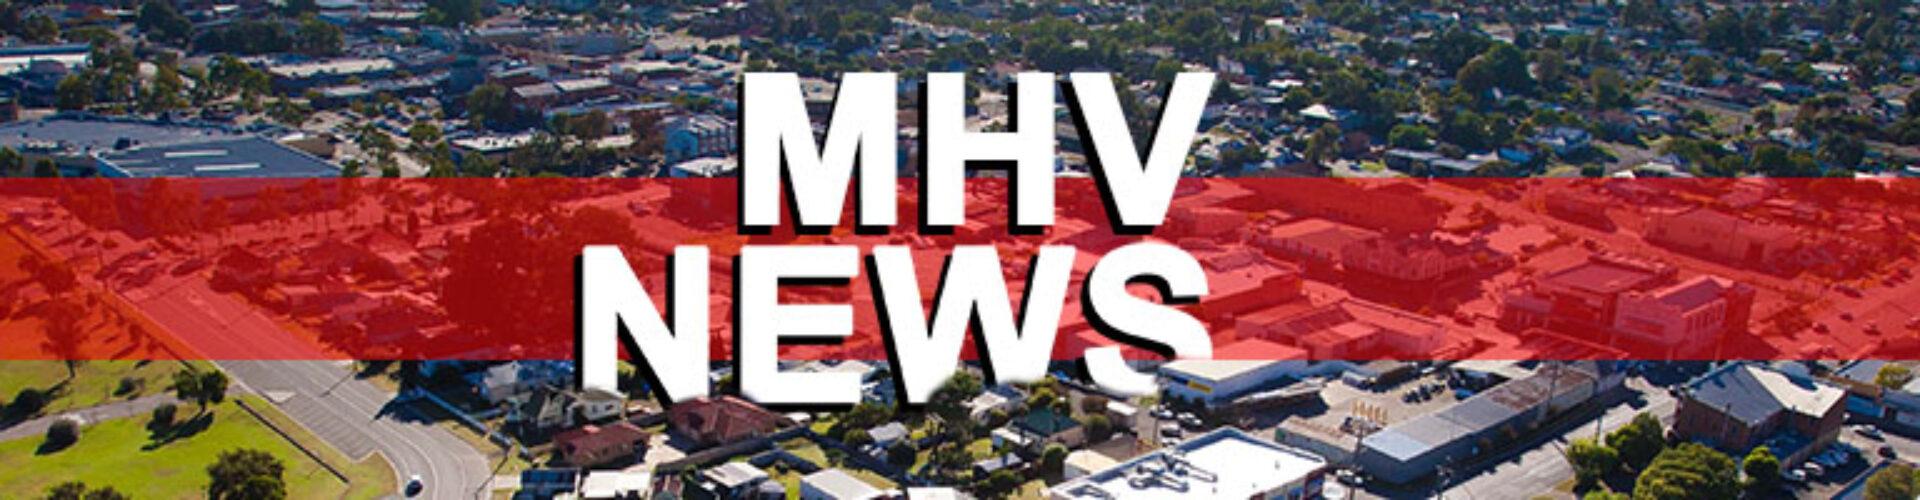 MHV NEWS